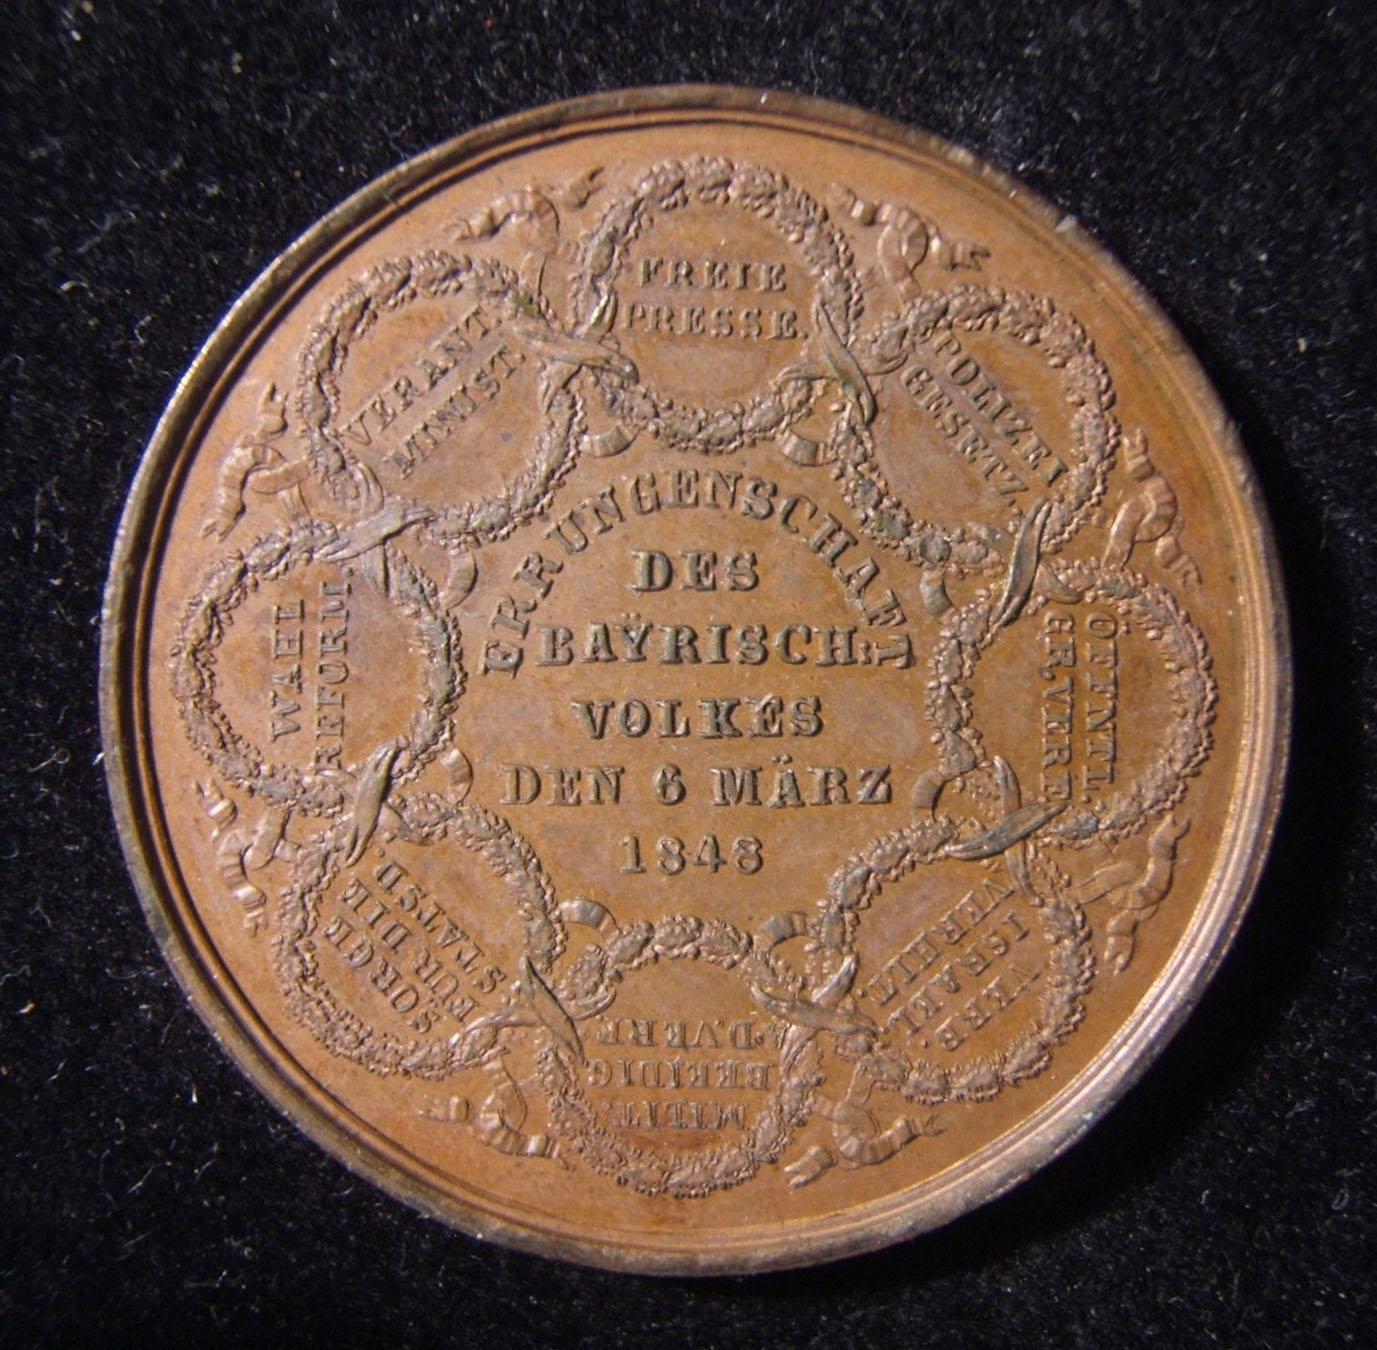 Germany: Commemoration of German Revolution, 1848; by Drentwett; struck in bronze; size: 37.5mm; weight: 17.4g; medal align. Obv.: leg.